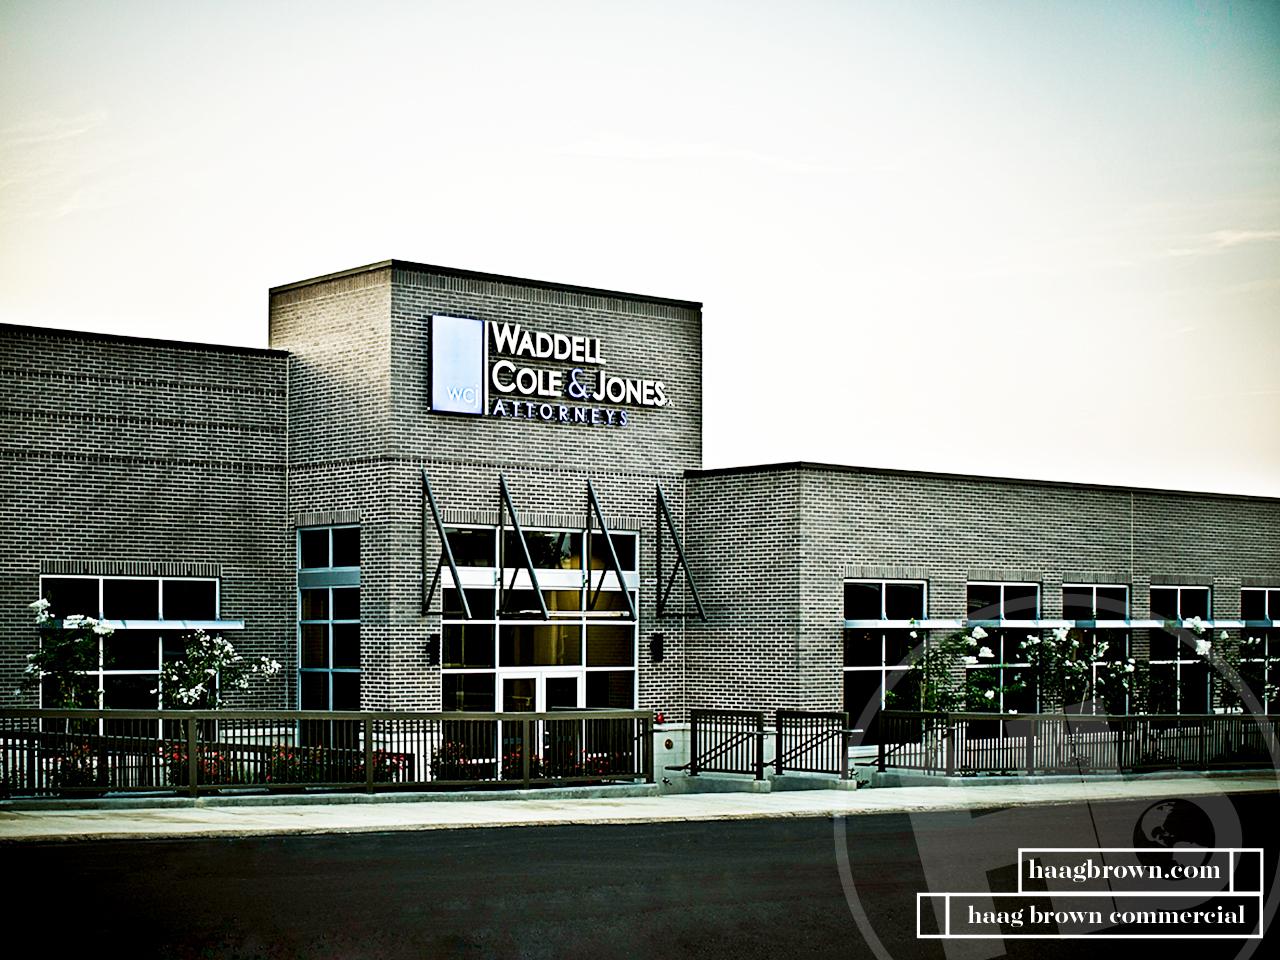 Waddell Cole & Jones in Jonesboro, AR